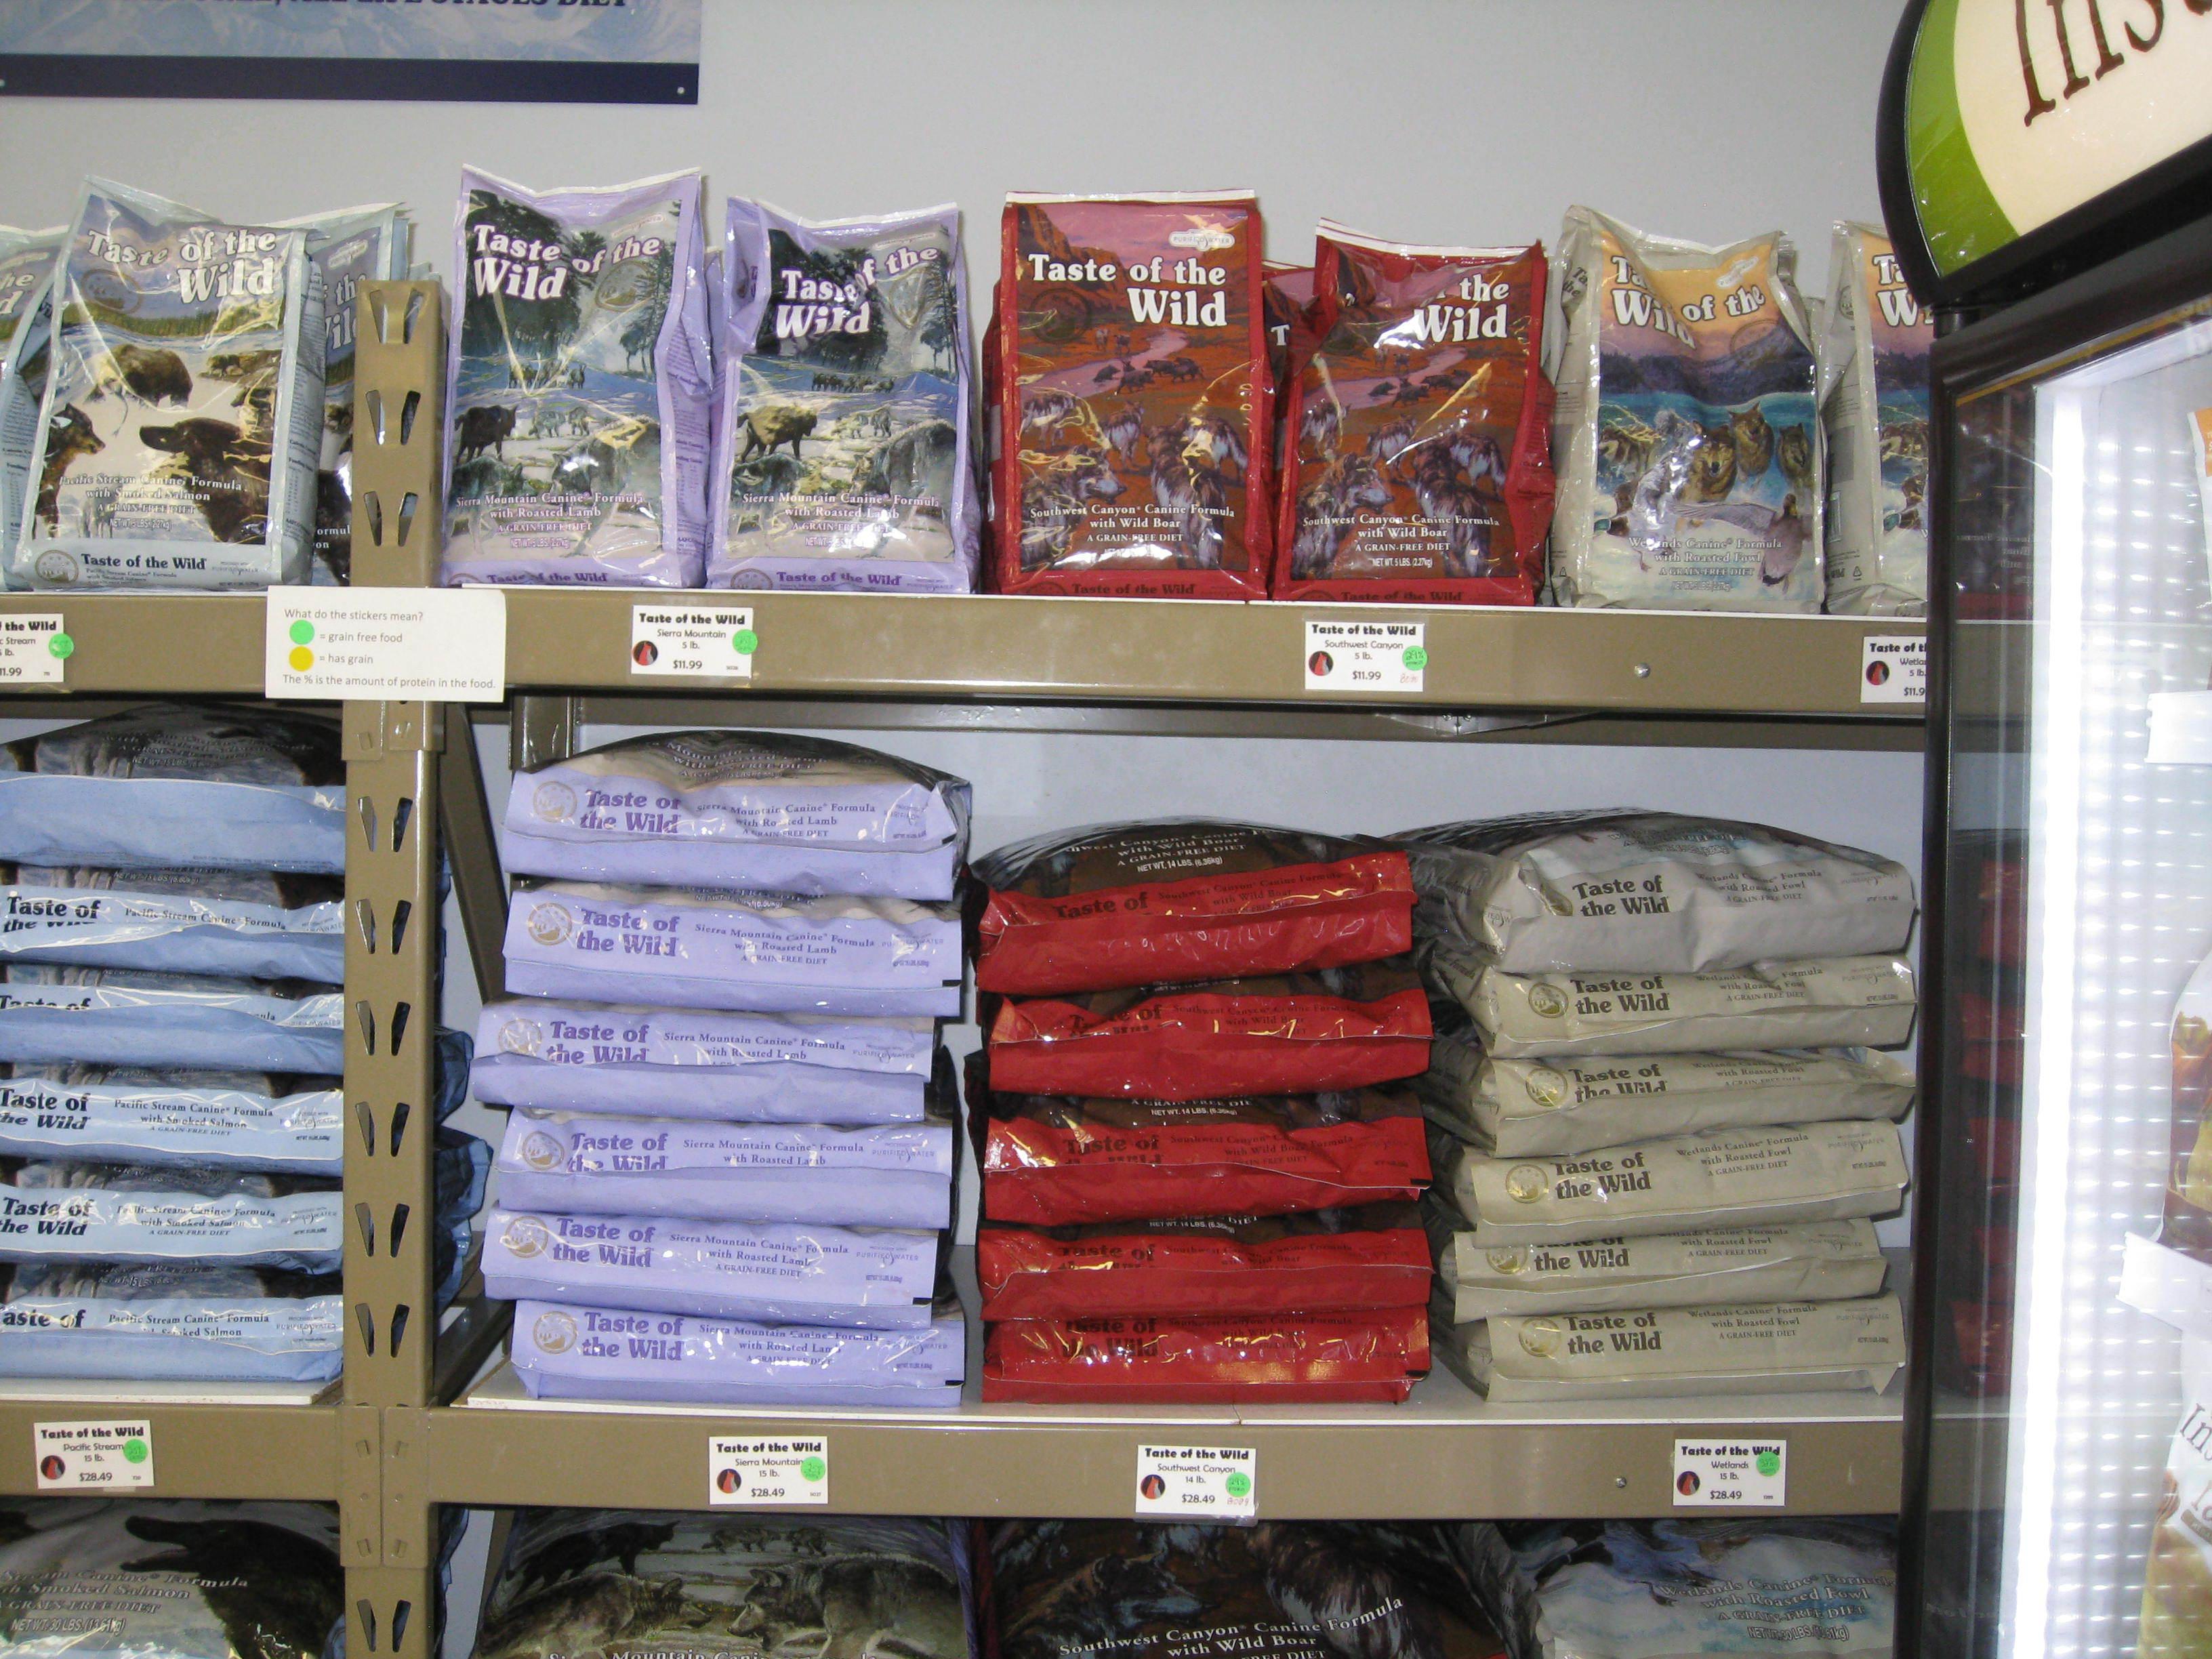 Taste of the Wild Pet Food at Wags & Whiskers in La Crosse, WI